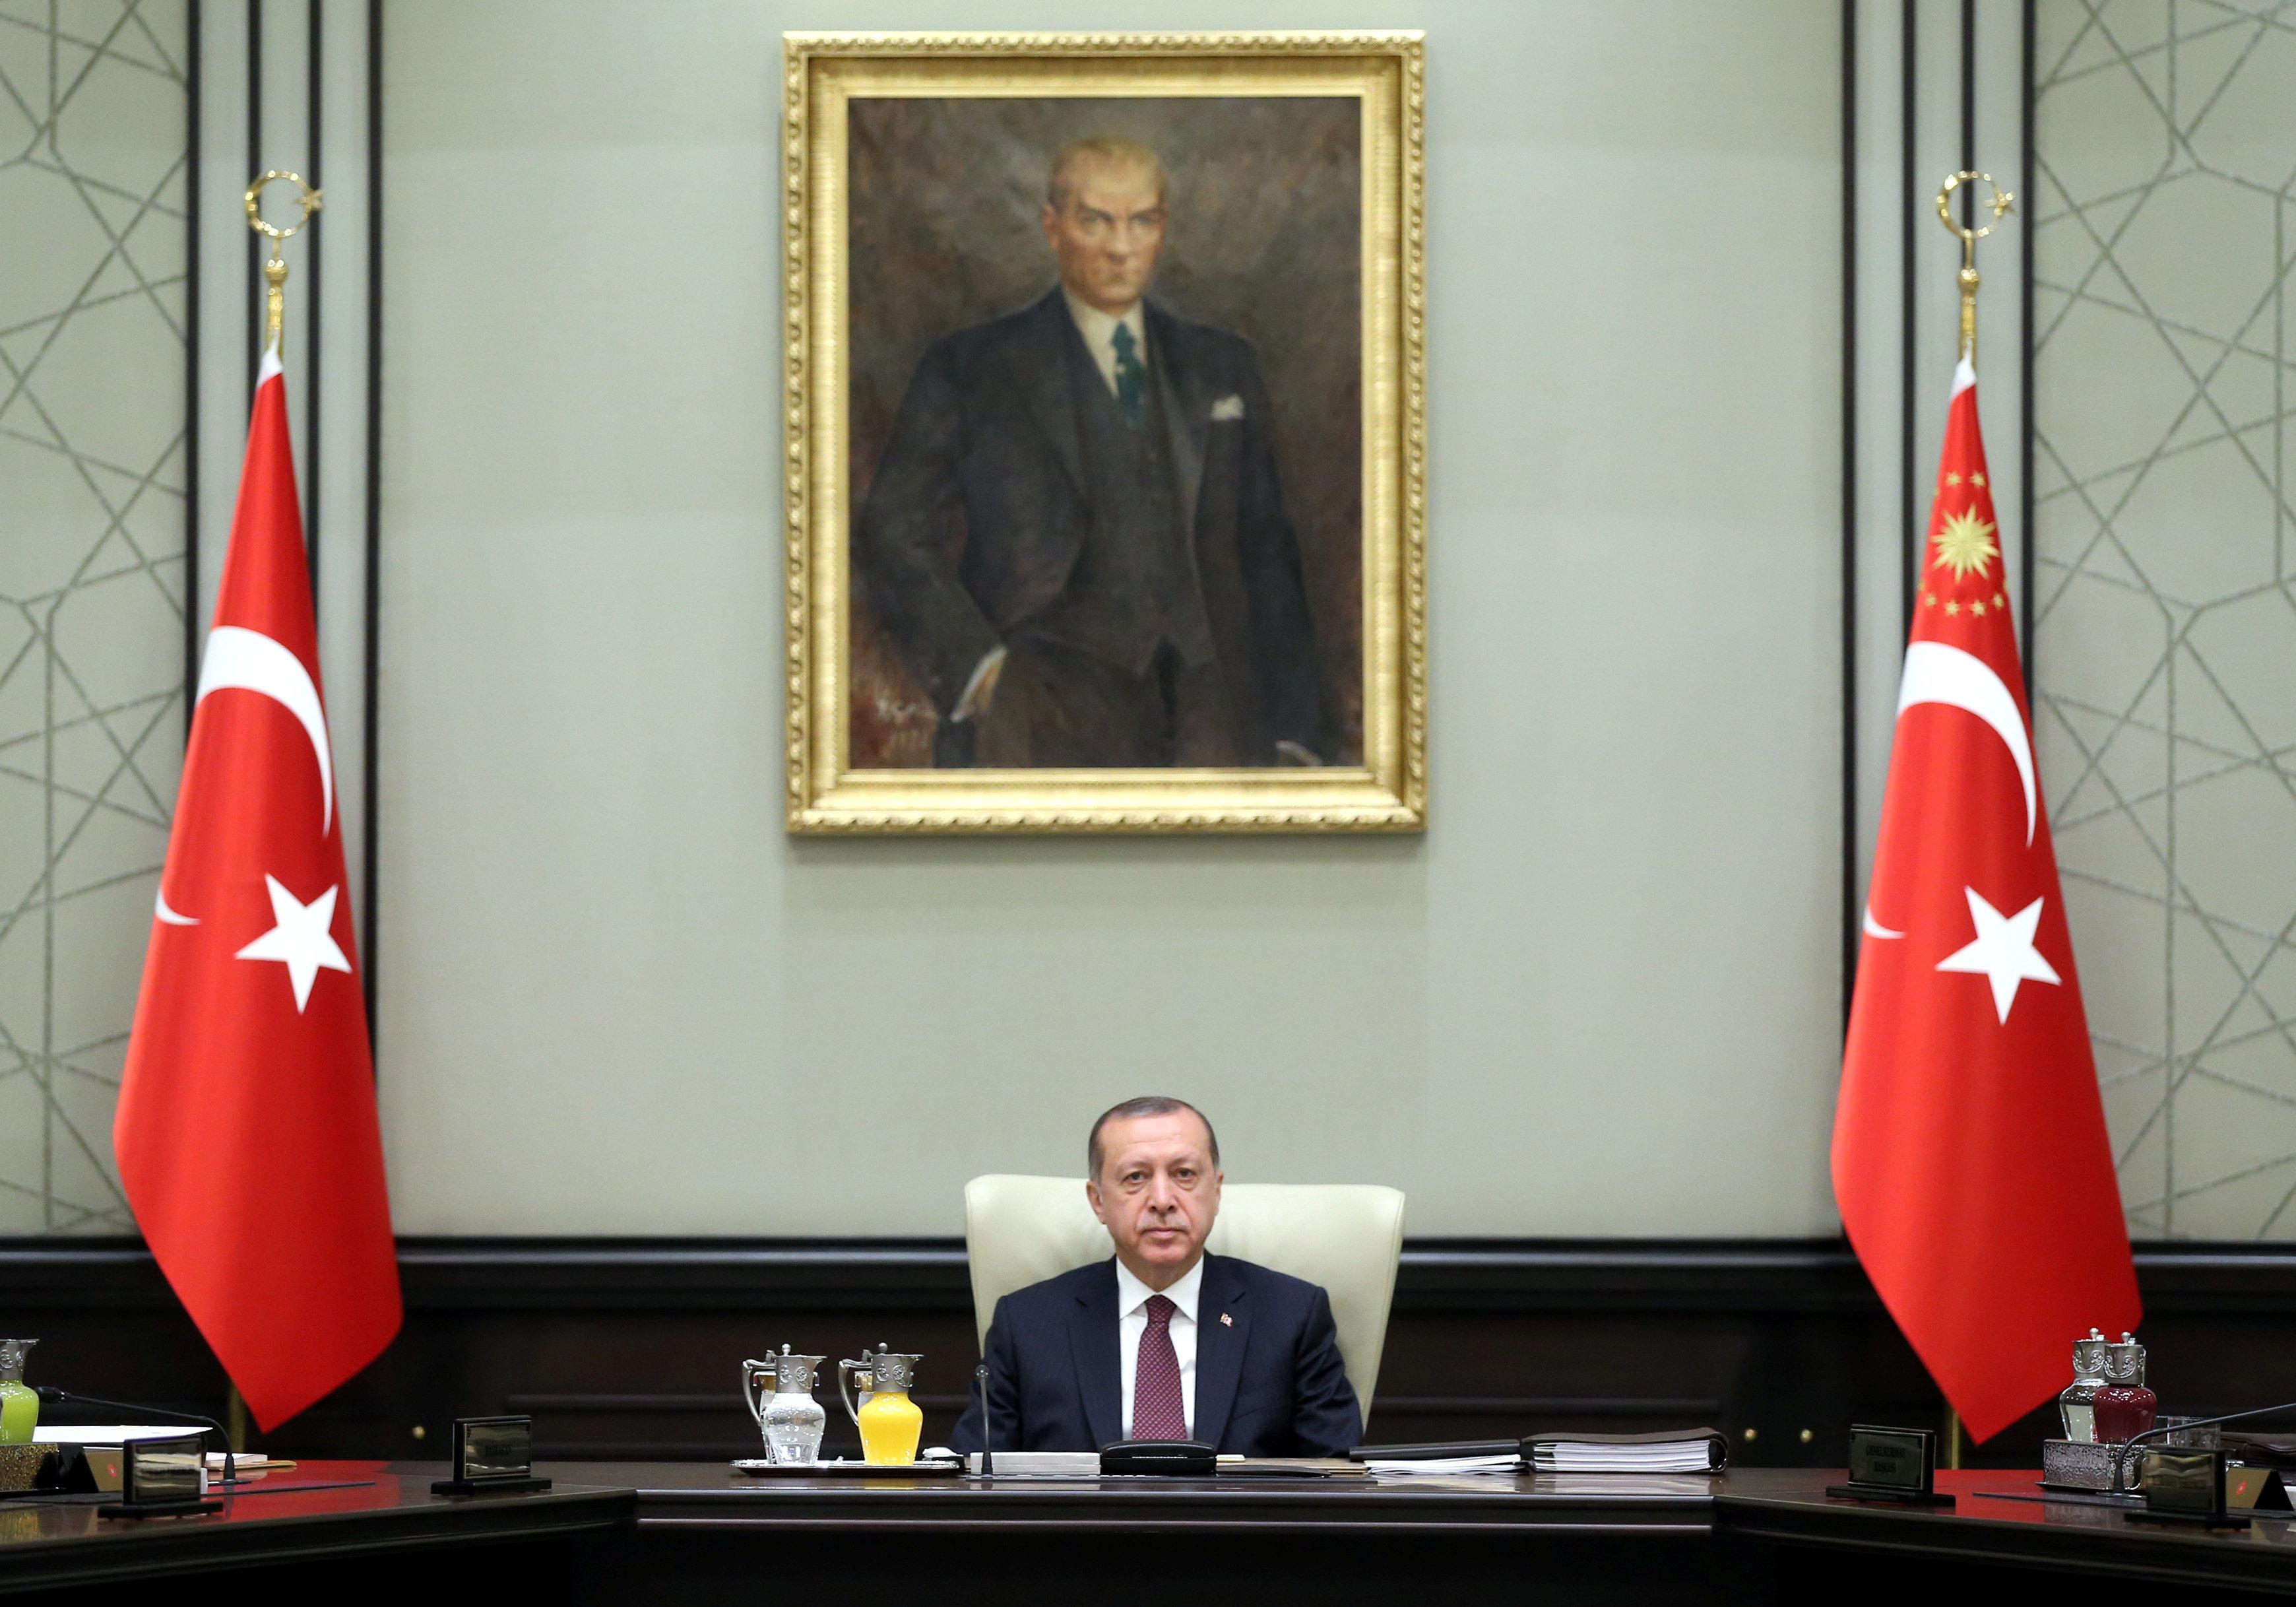 Turkish President Tayyip Erdogan chairs a National Security Council meeting in Ankara, Turkey, July 17, 2017